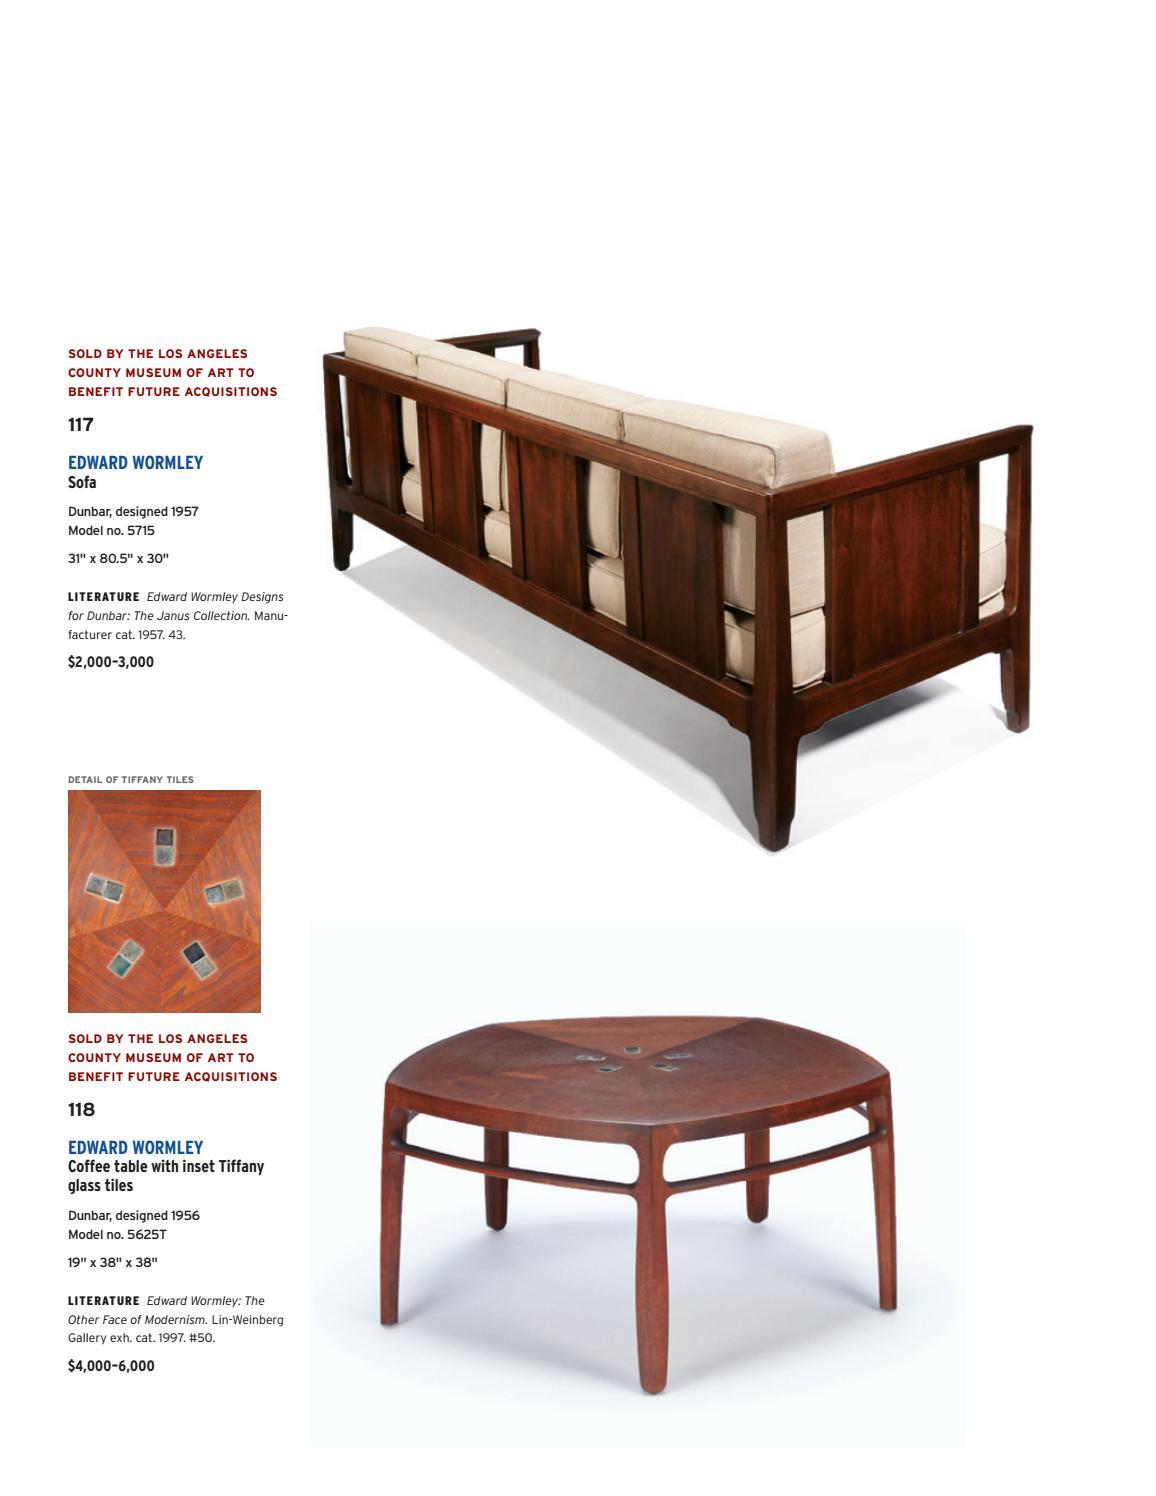 Wondrous Los Angeles Modern Auctions Lama May 21 2017 Modern Art Uwap Interior Chair Design Uwaporg